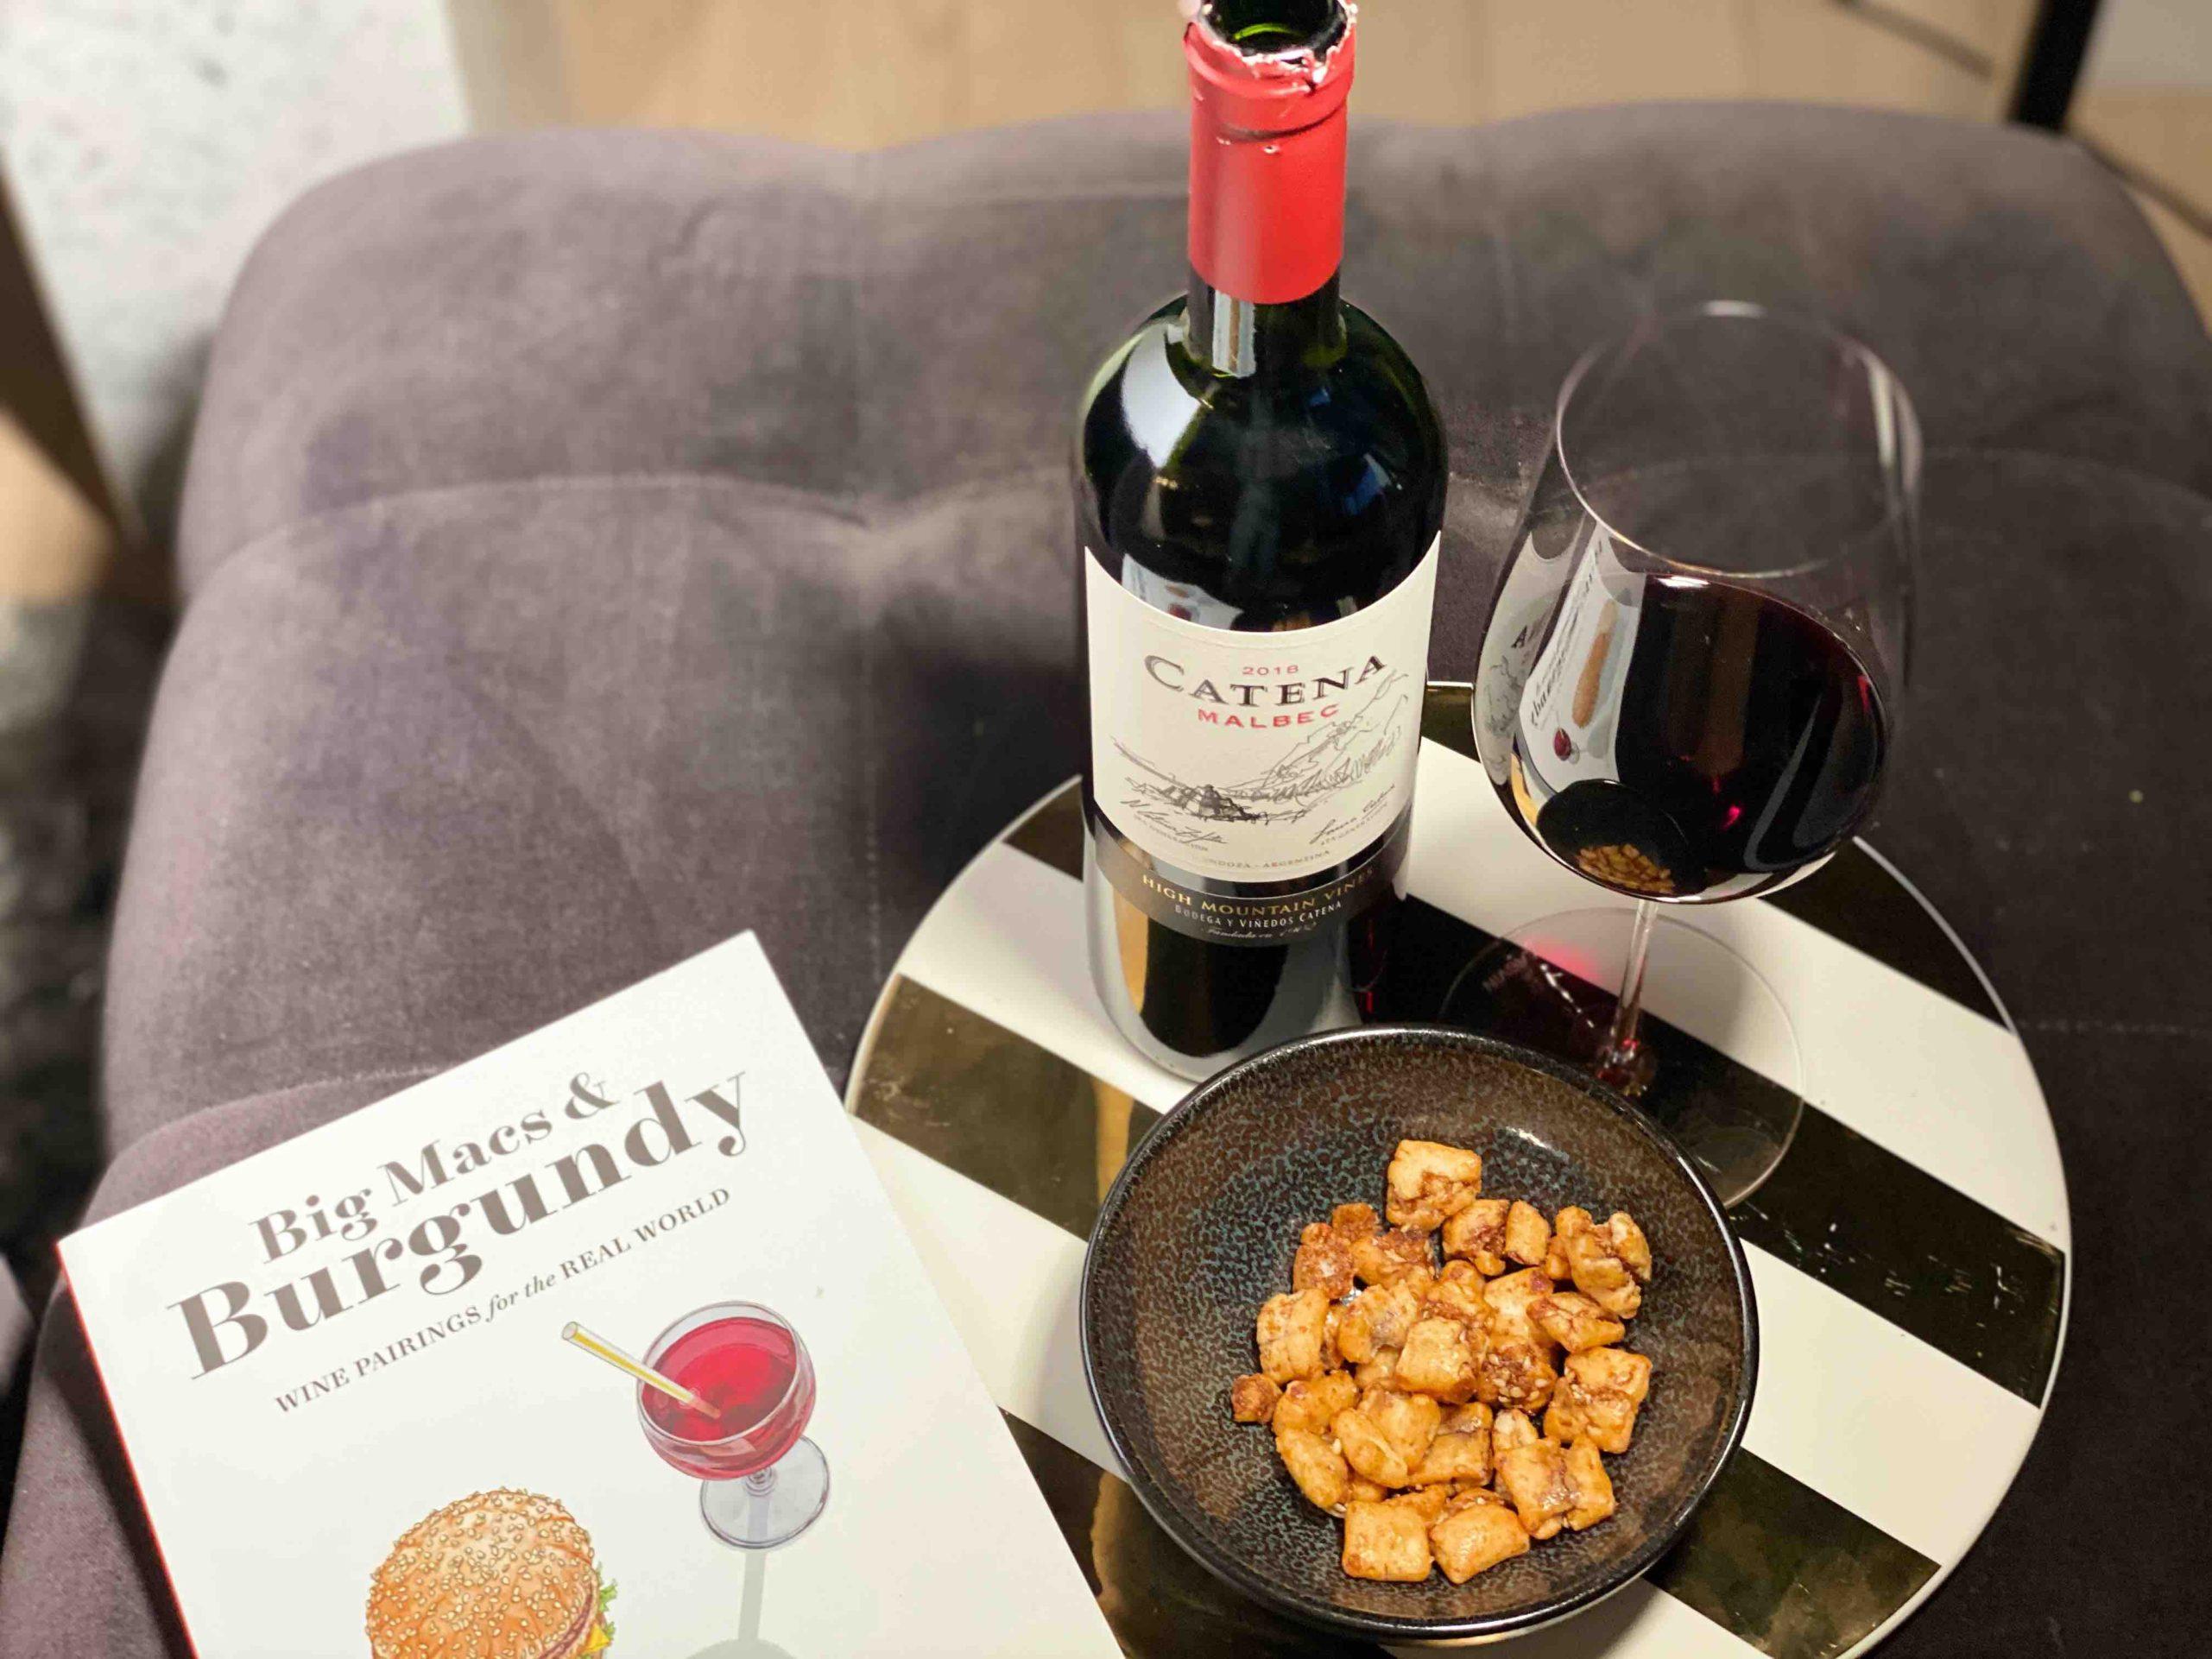 Catena Malbec Wine Of Argentina